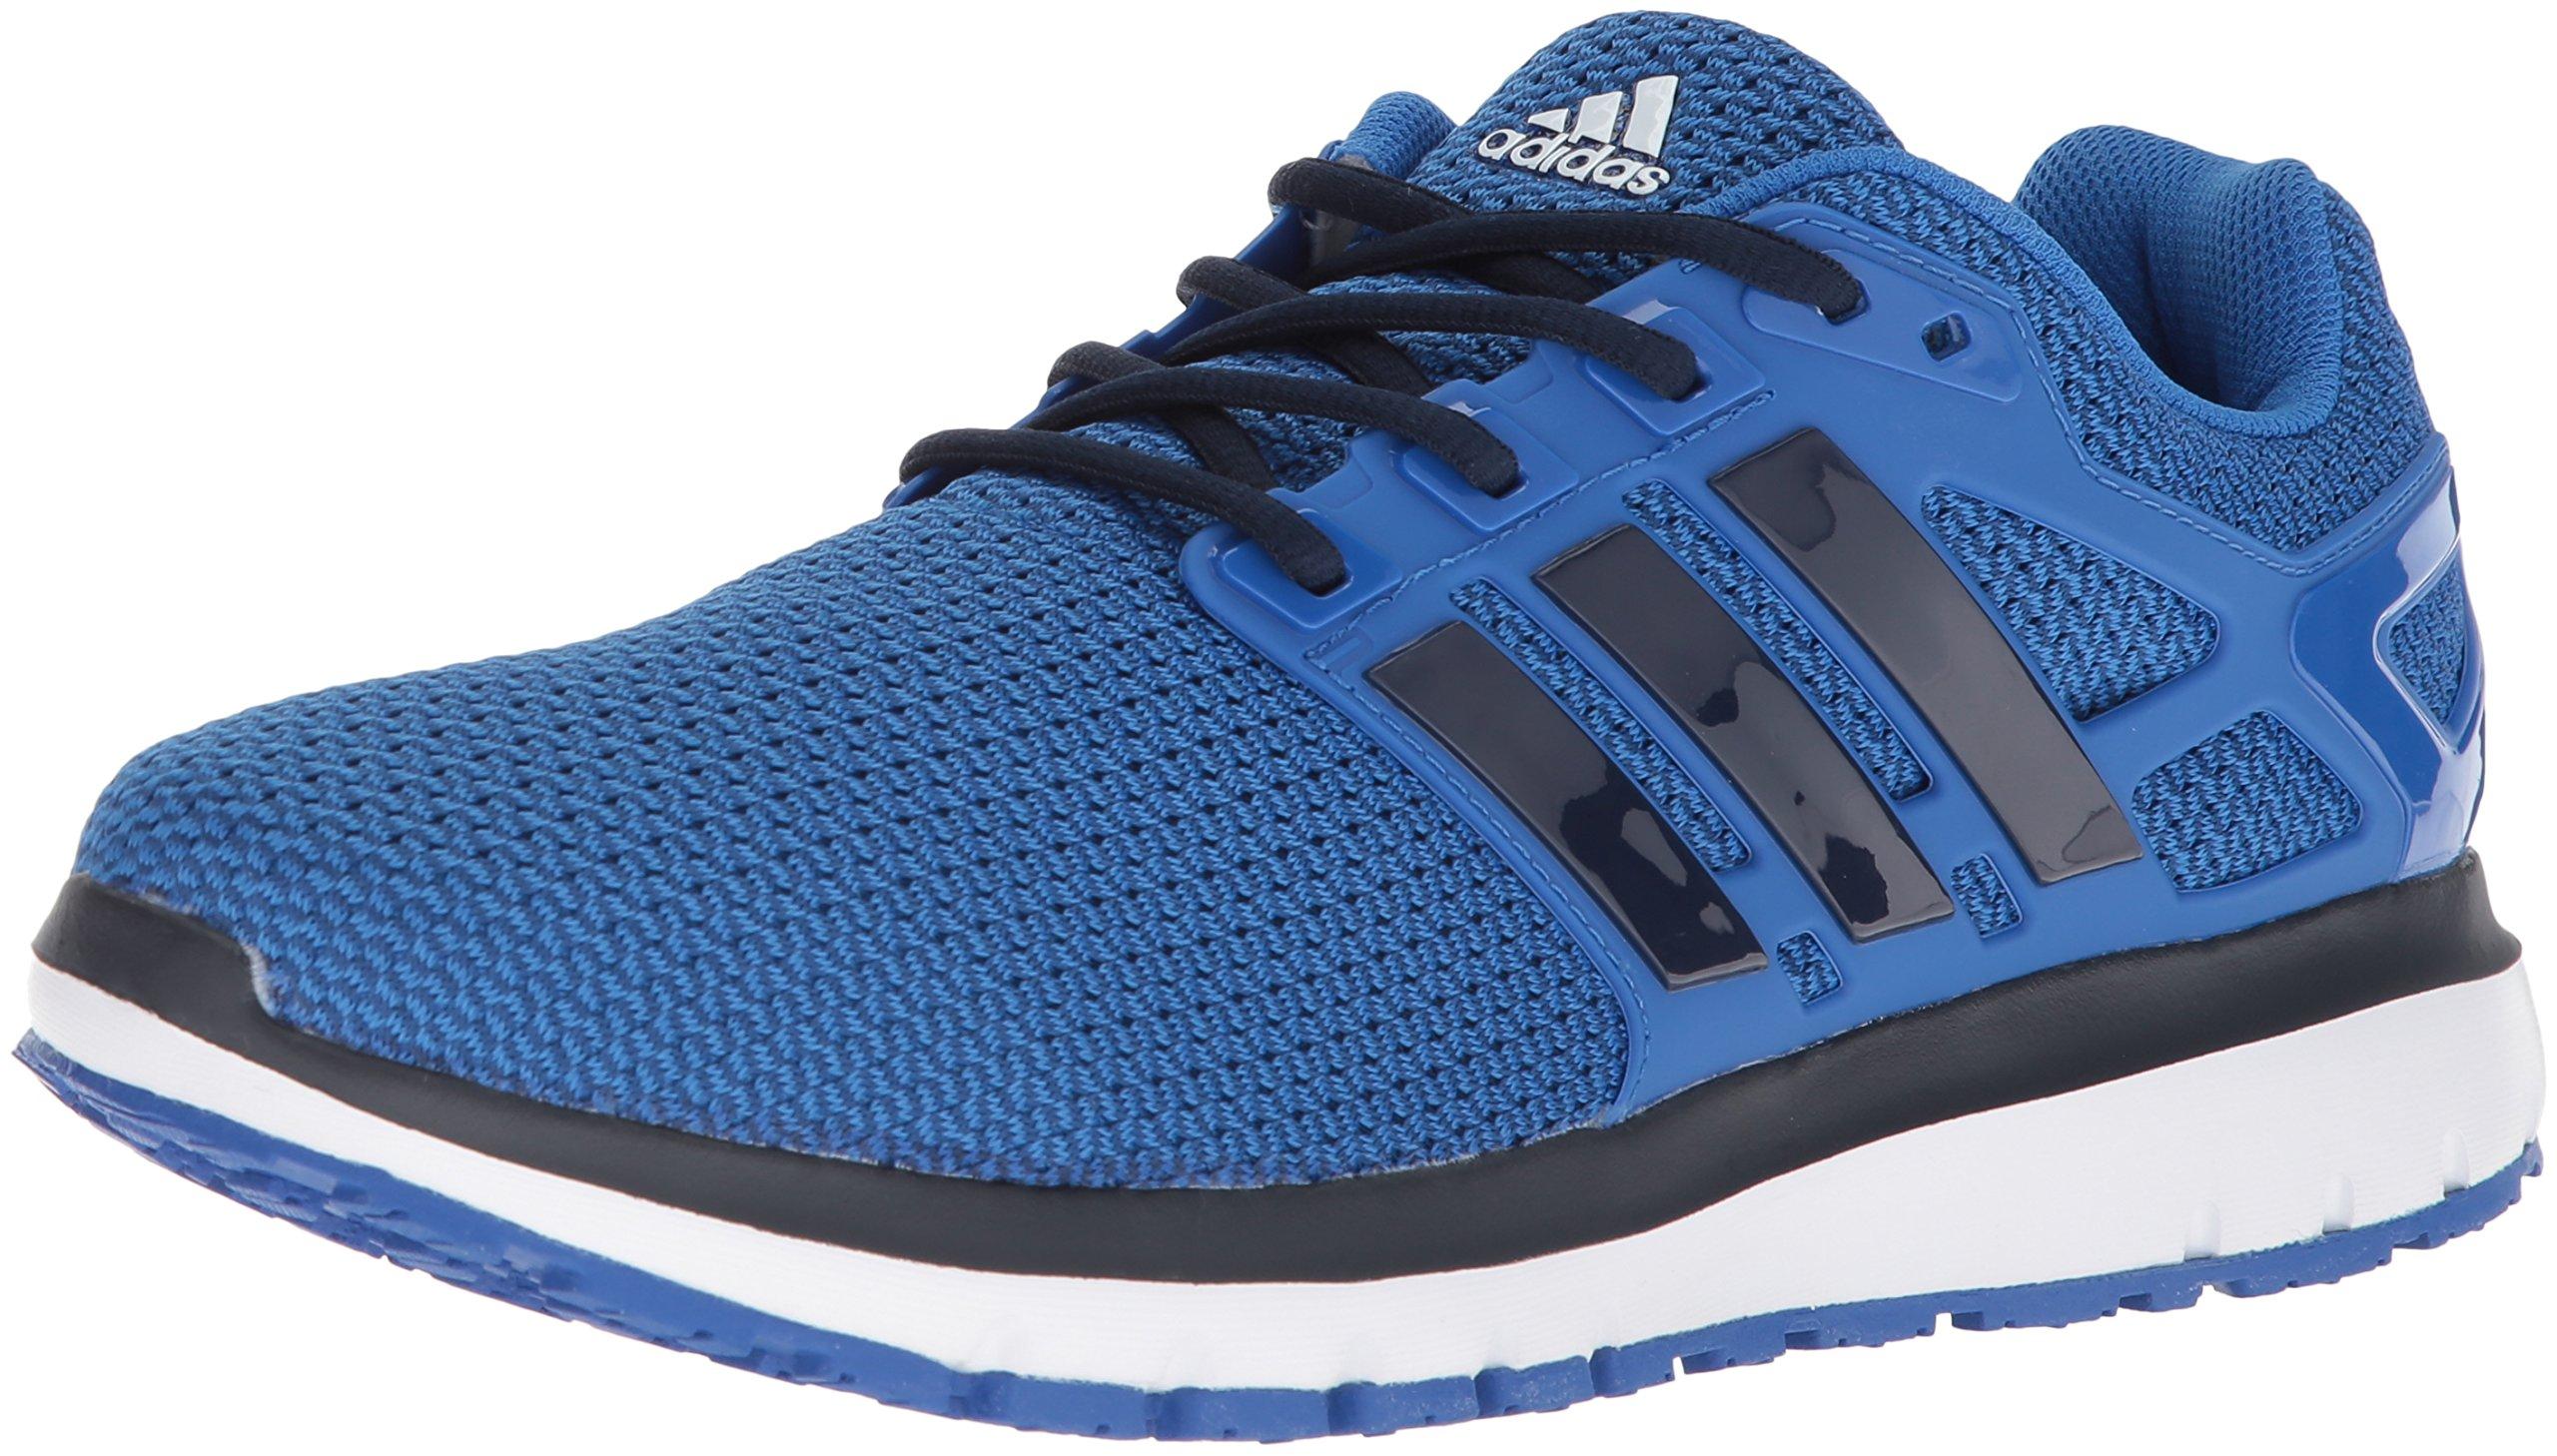 new style 64680 e9d26 Galleon - Adidas Womens Energy Cloud V Running Shoe, Trace BlueTrace  BlueChalk Blue, 7.5 M US